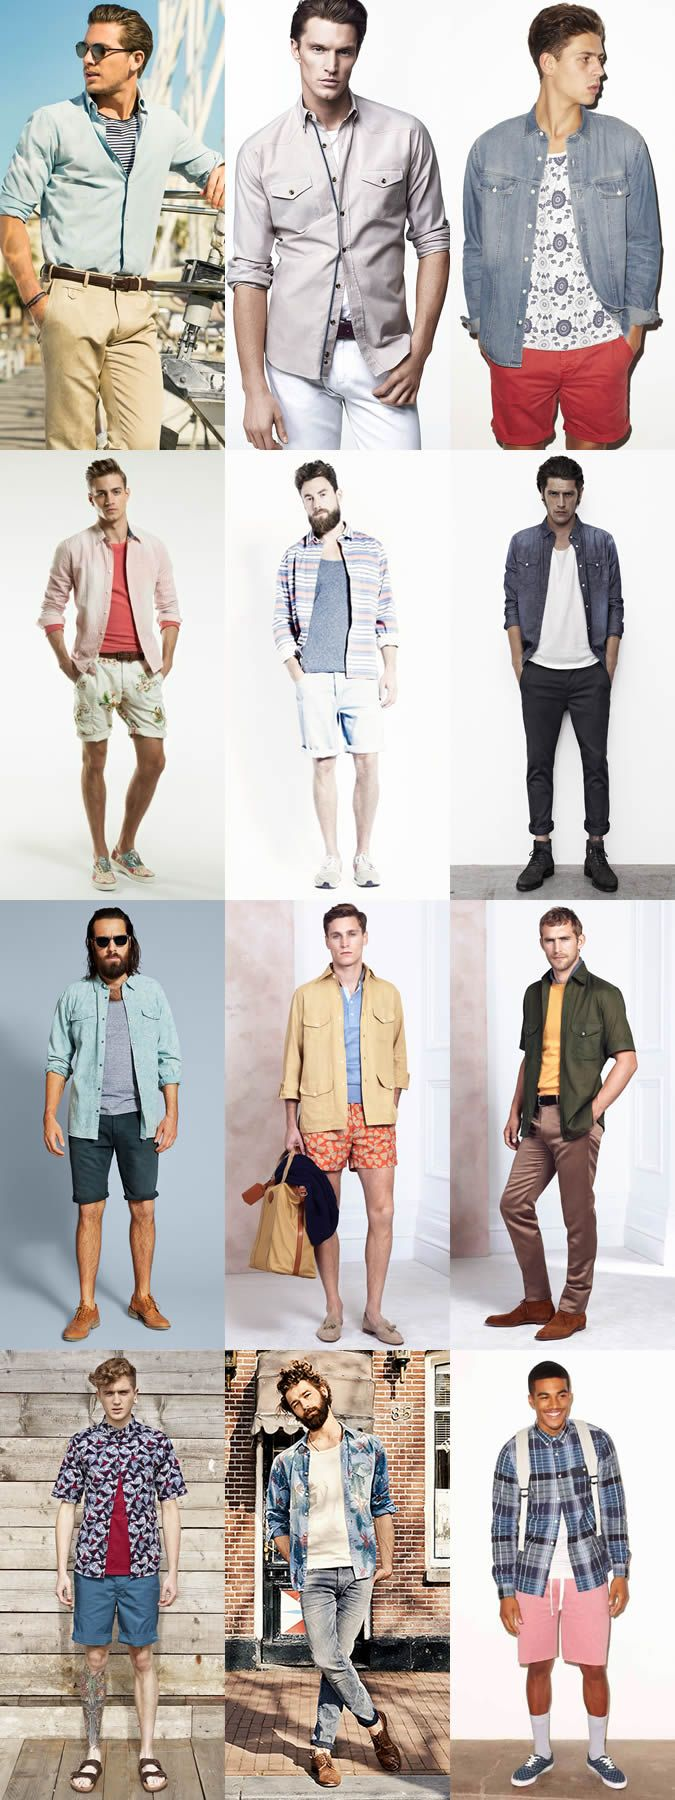 28cfe0cabec7 Men s Summer Shirt Layering - Outfit Inspiration Lookbook